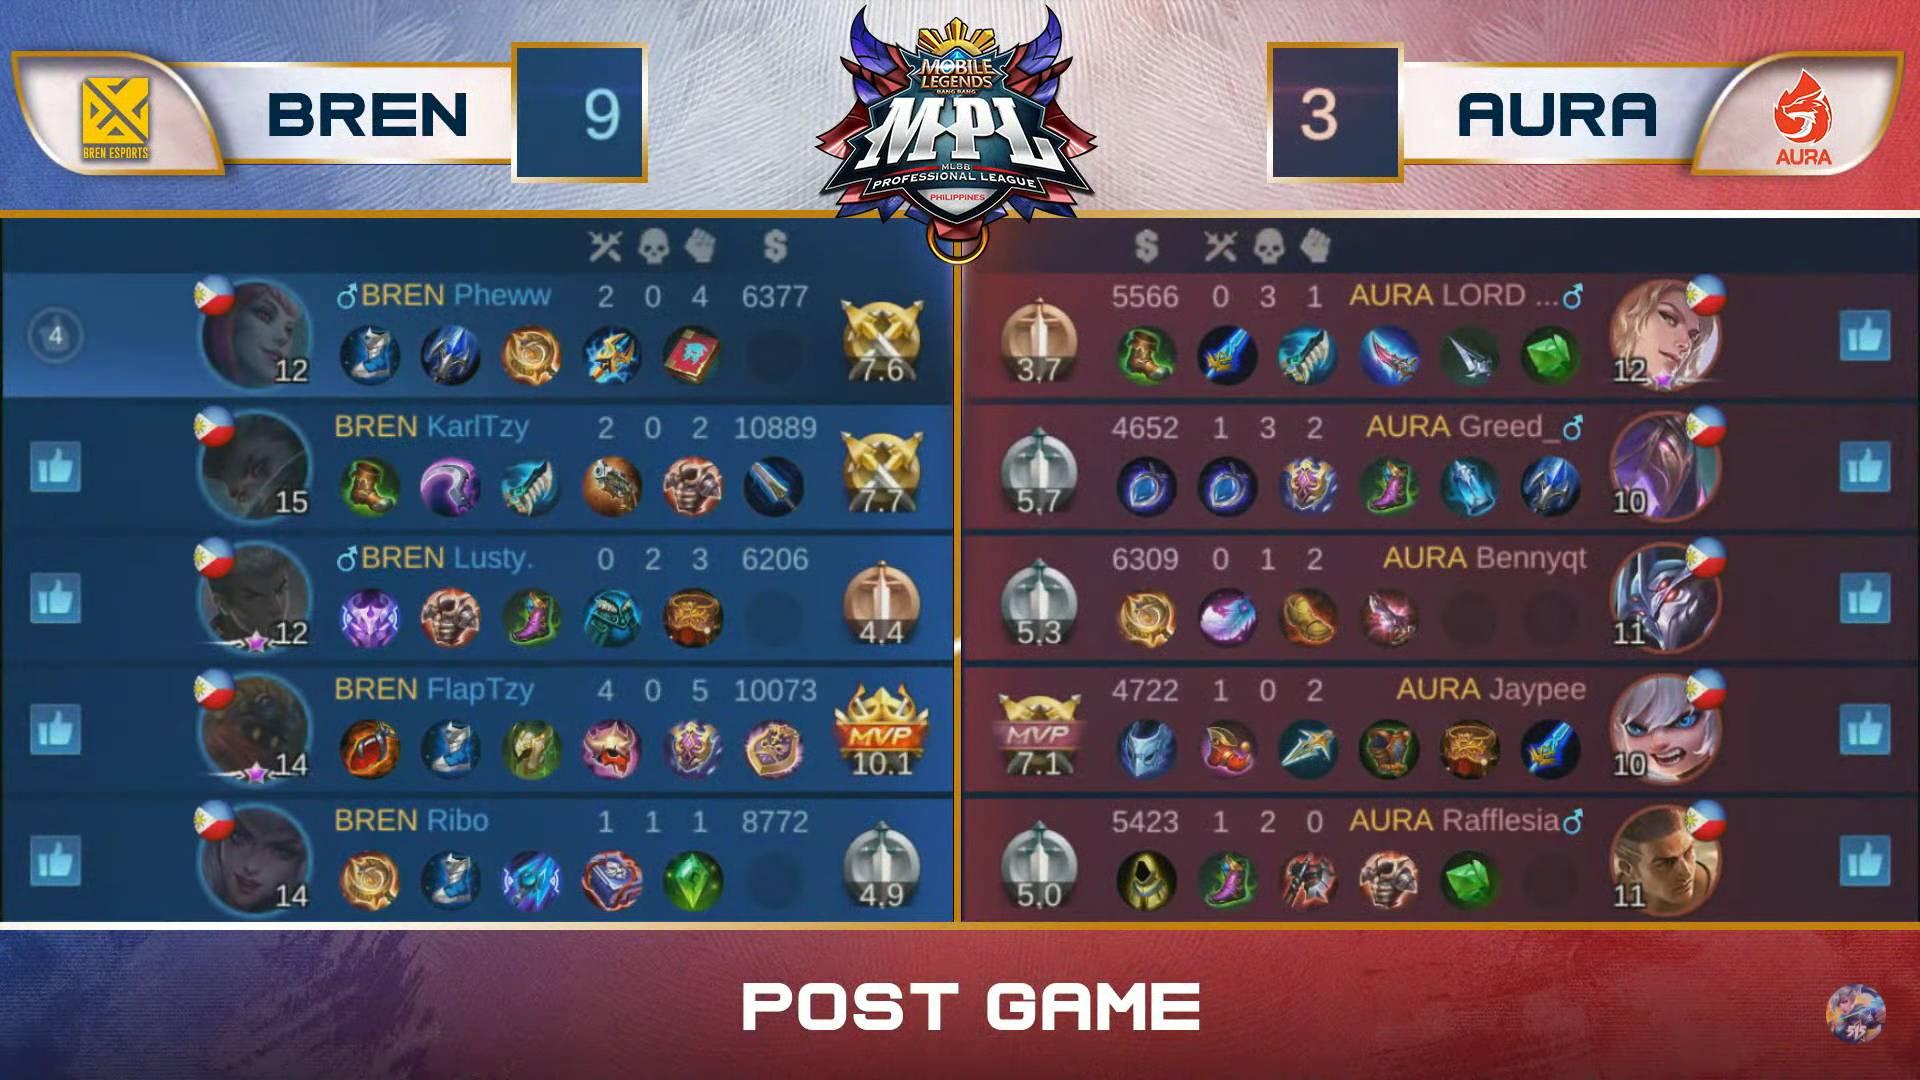 MPL-PH-Season-7-Aura-def-Bren-Game-2 Bennyqt takes over late vs Bren as Aura gains share of MPL PH lead ESports Mobile Legends MPL-PH News  - philippine sports news